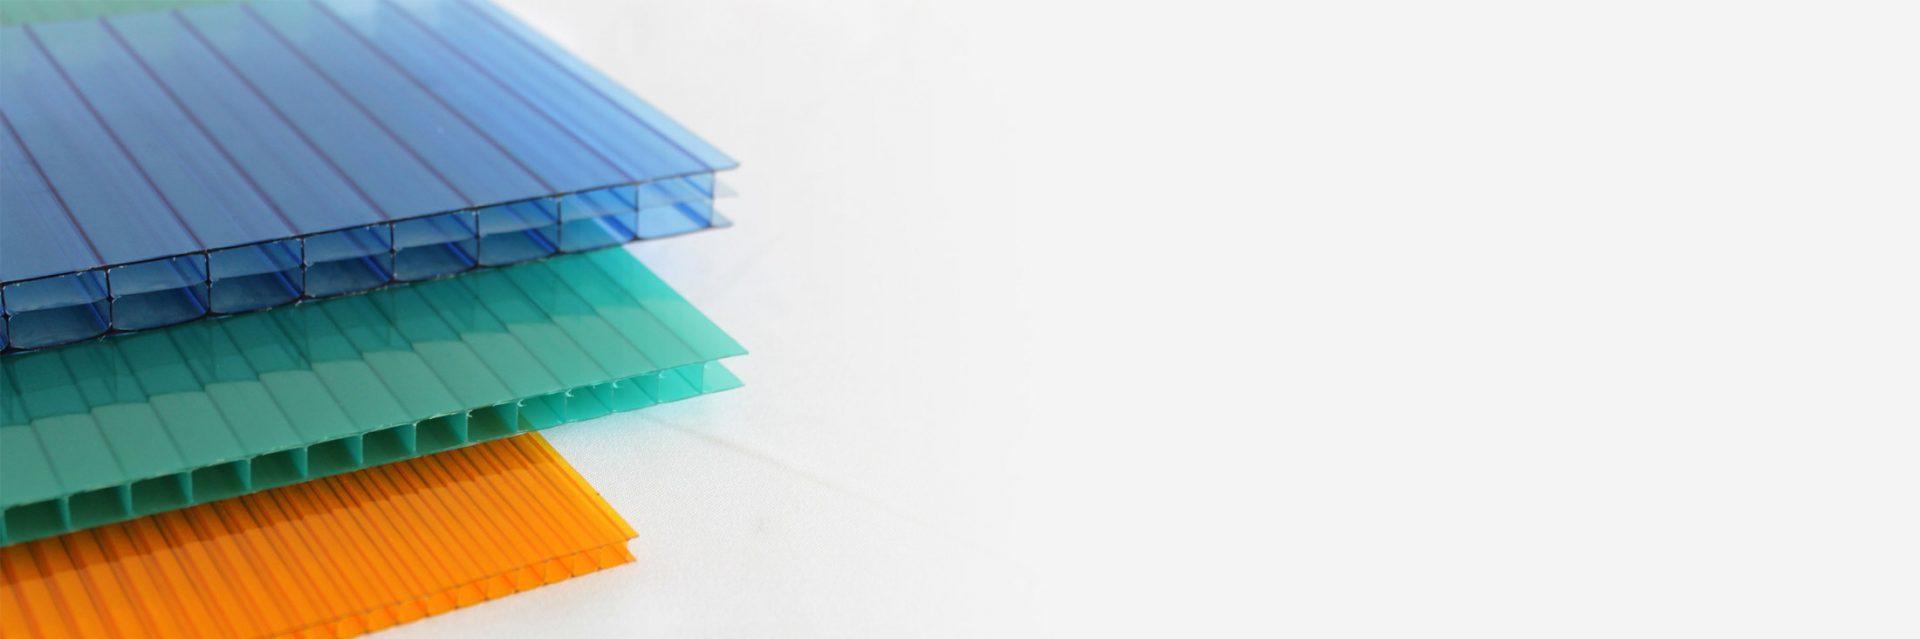 techos de policarbonato atérmico - policarbonato alveolar - planchas de policarbonato - láminas de policarbonato suizo | ALCRISTAL C.A.